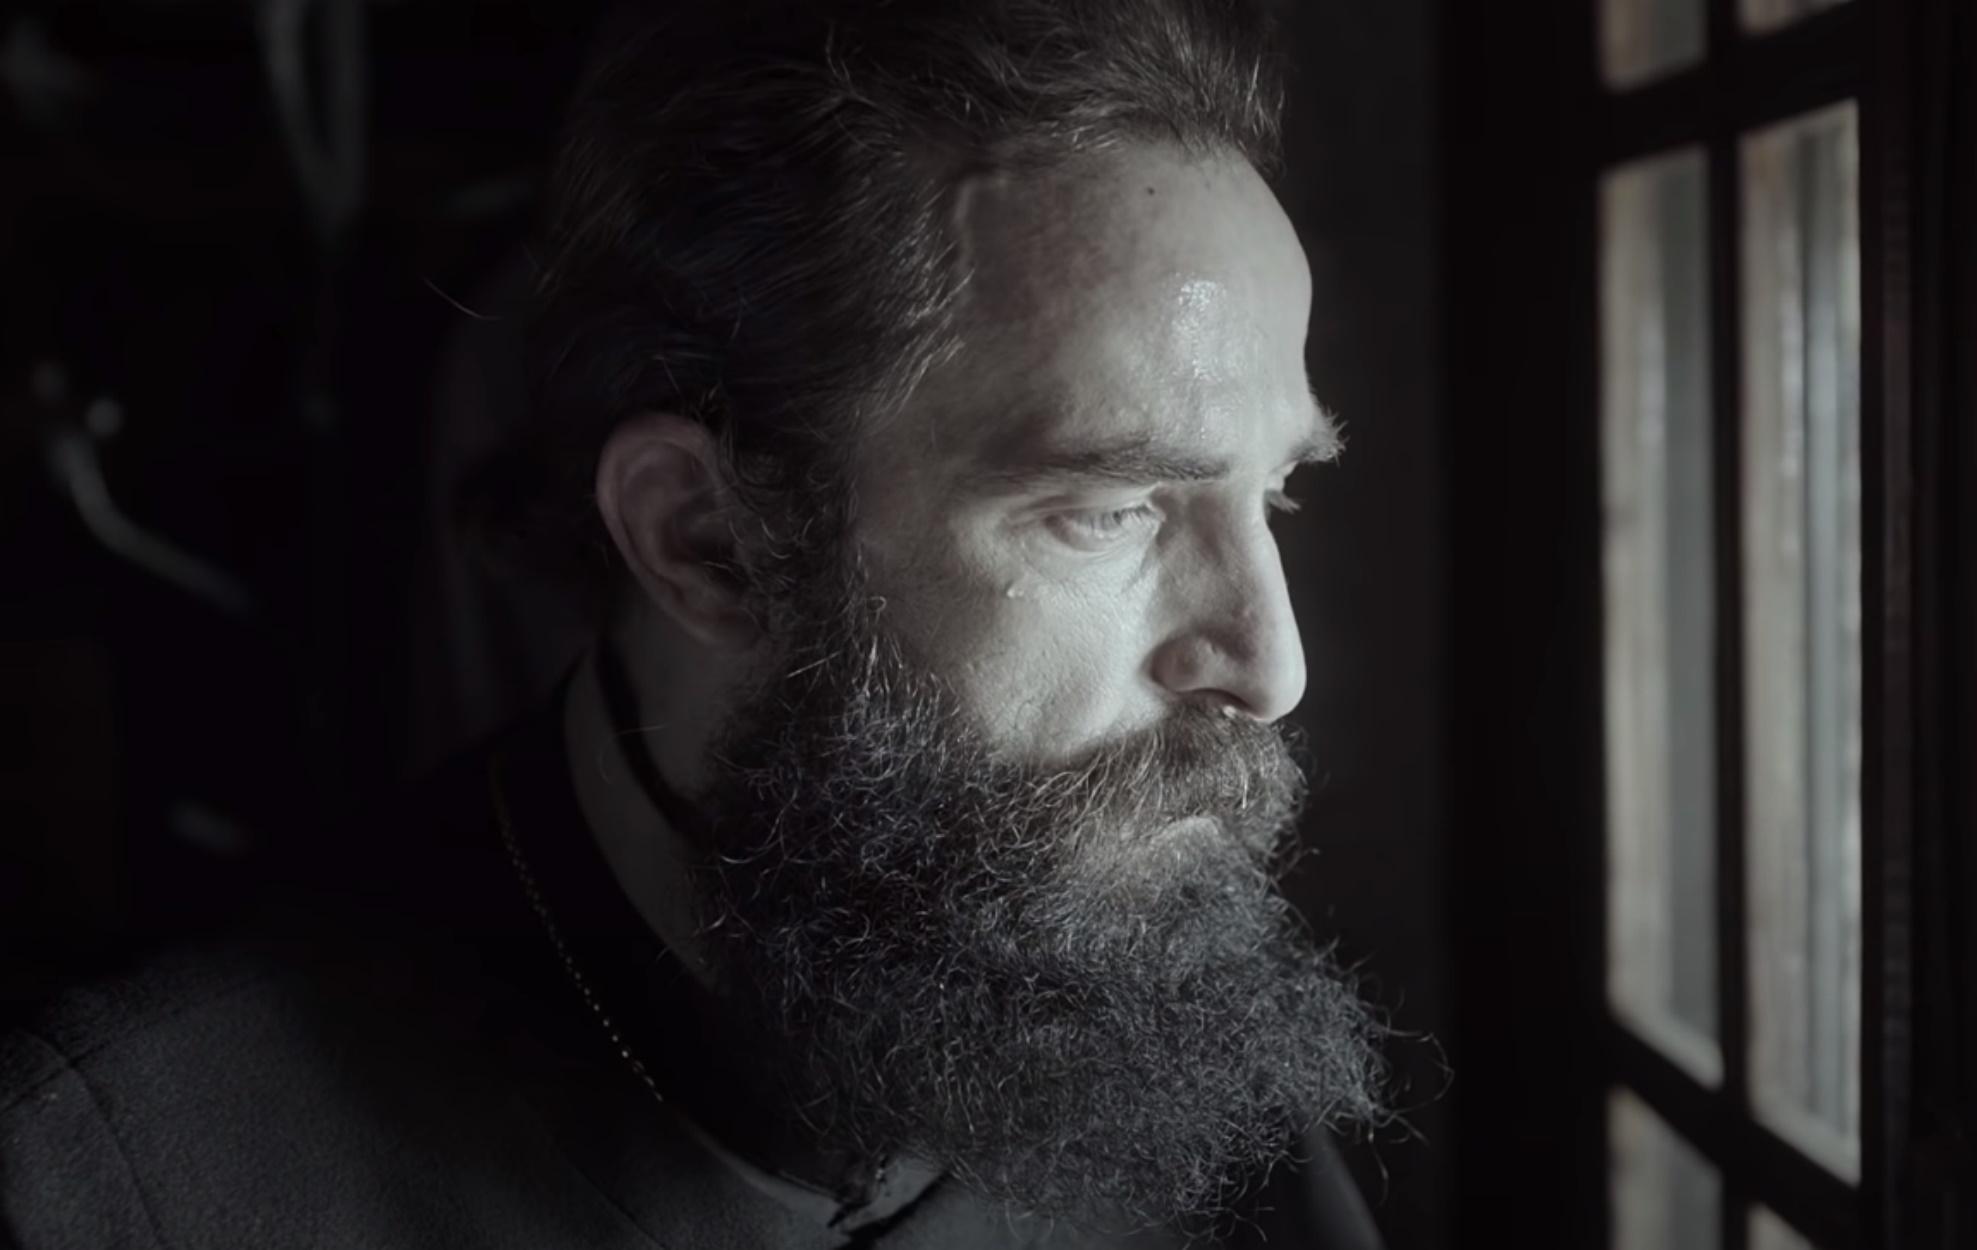 Tο τρέιλερ της ταινίας «Man Of God» με τον Αρη Σερβετάλη ως Άγιο Νεκτάριο